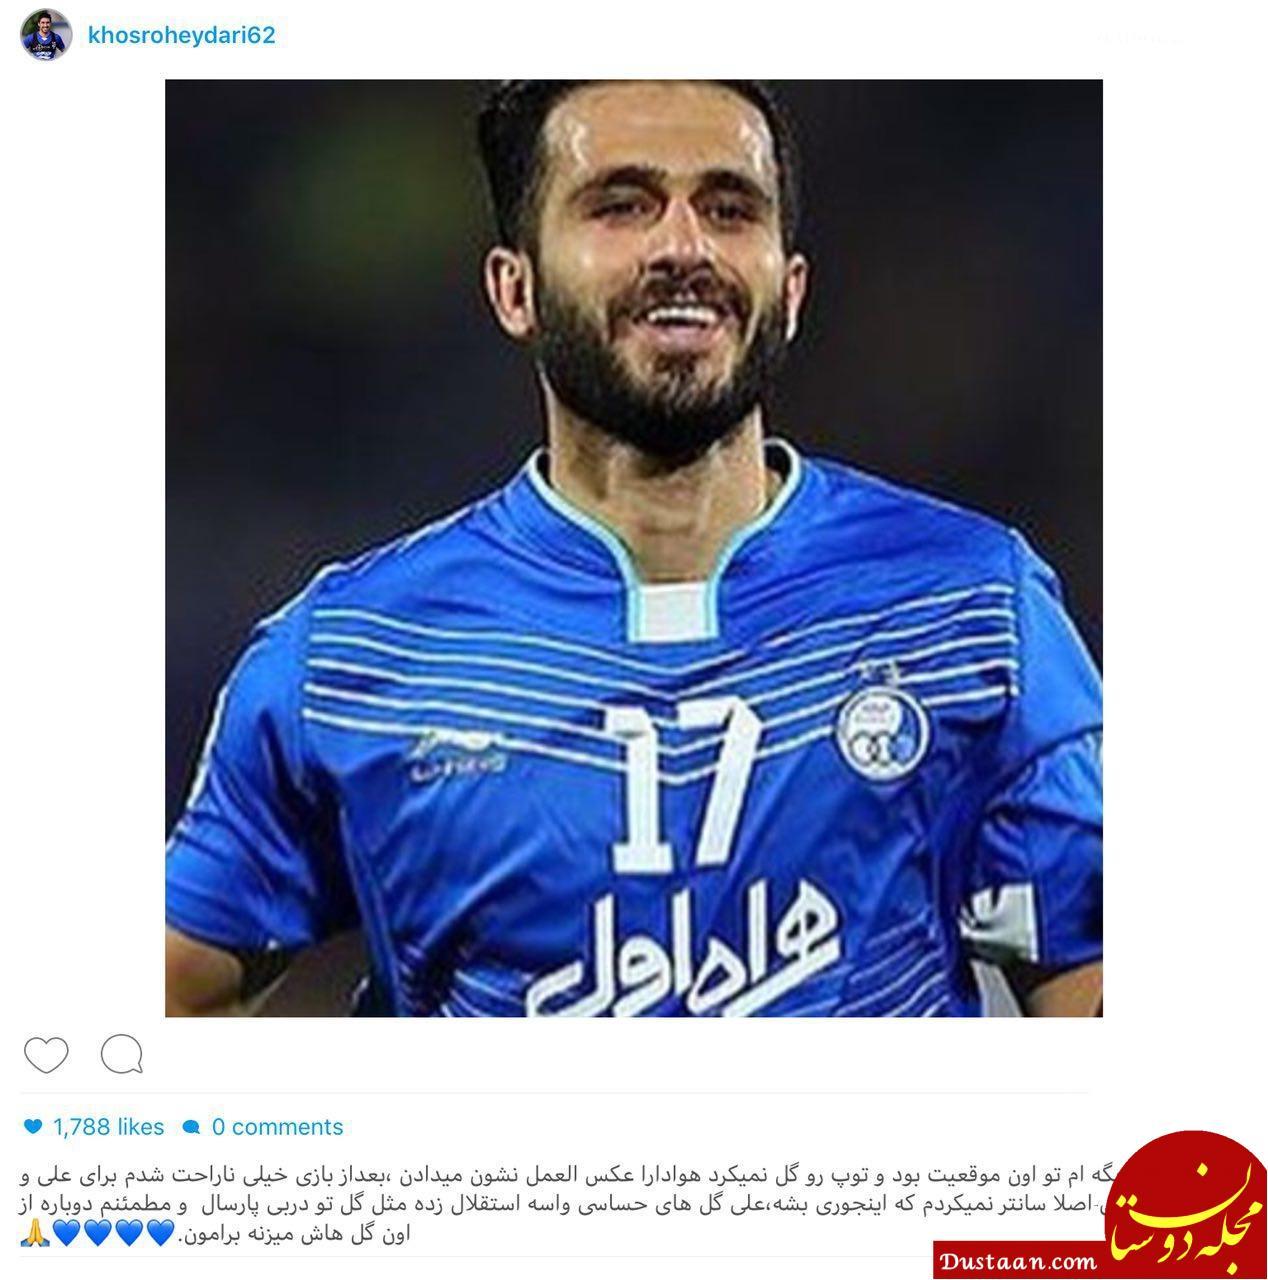 www.dustaan.com پست اینستاگرامی خسرو حیدری بعد از تساوی استقلال +عکس